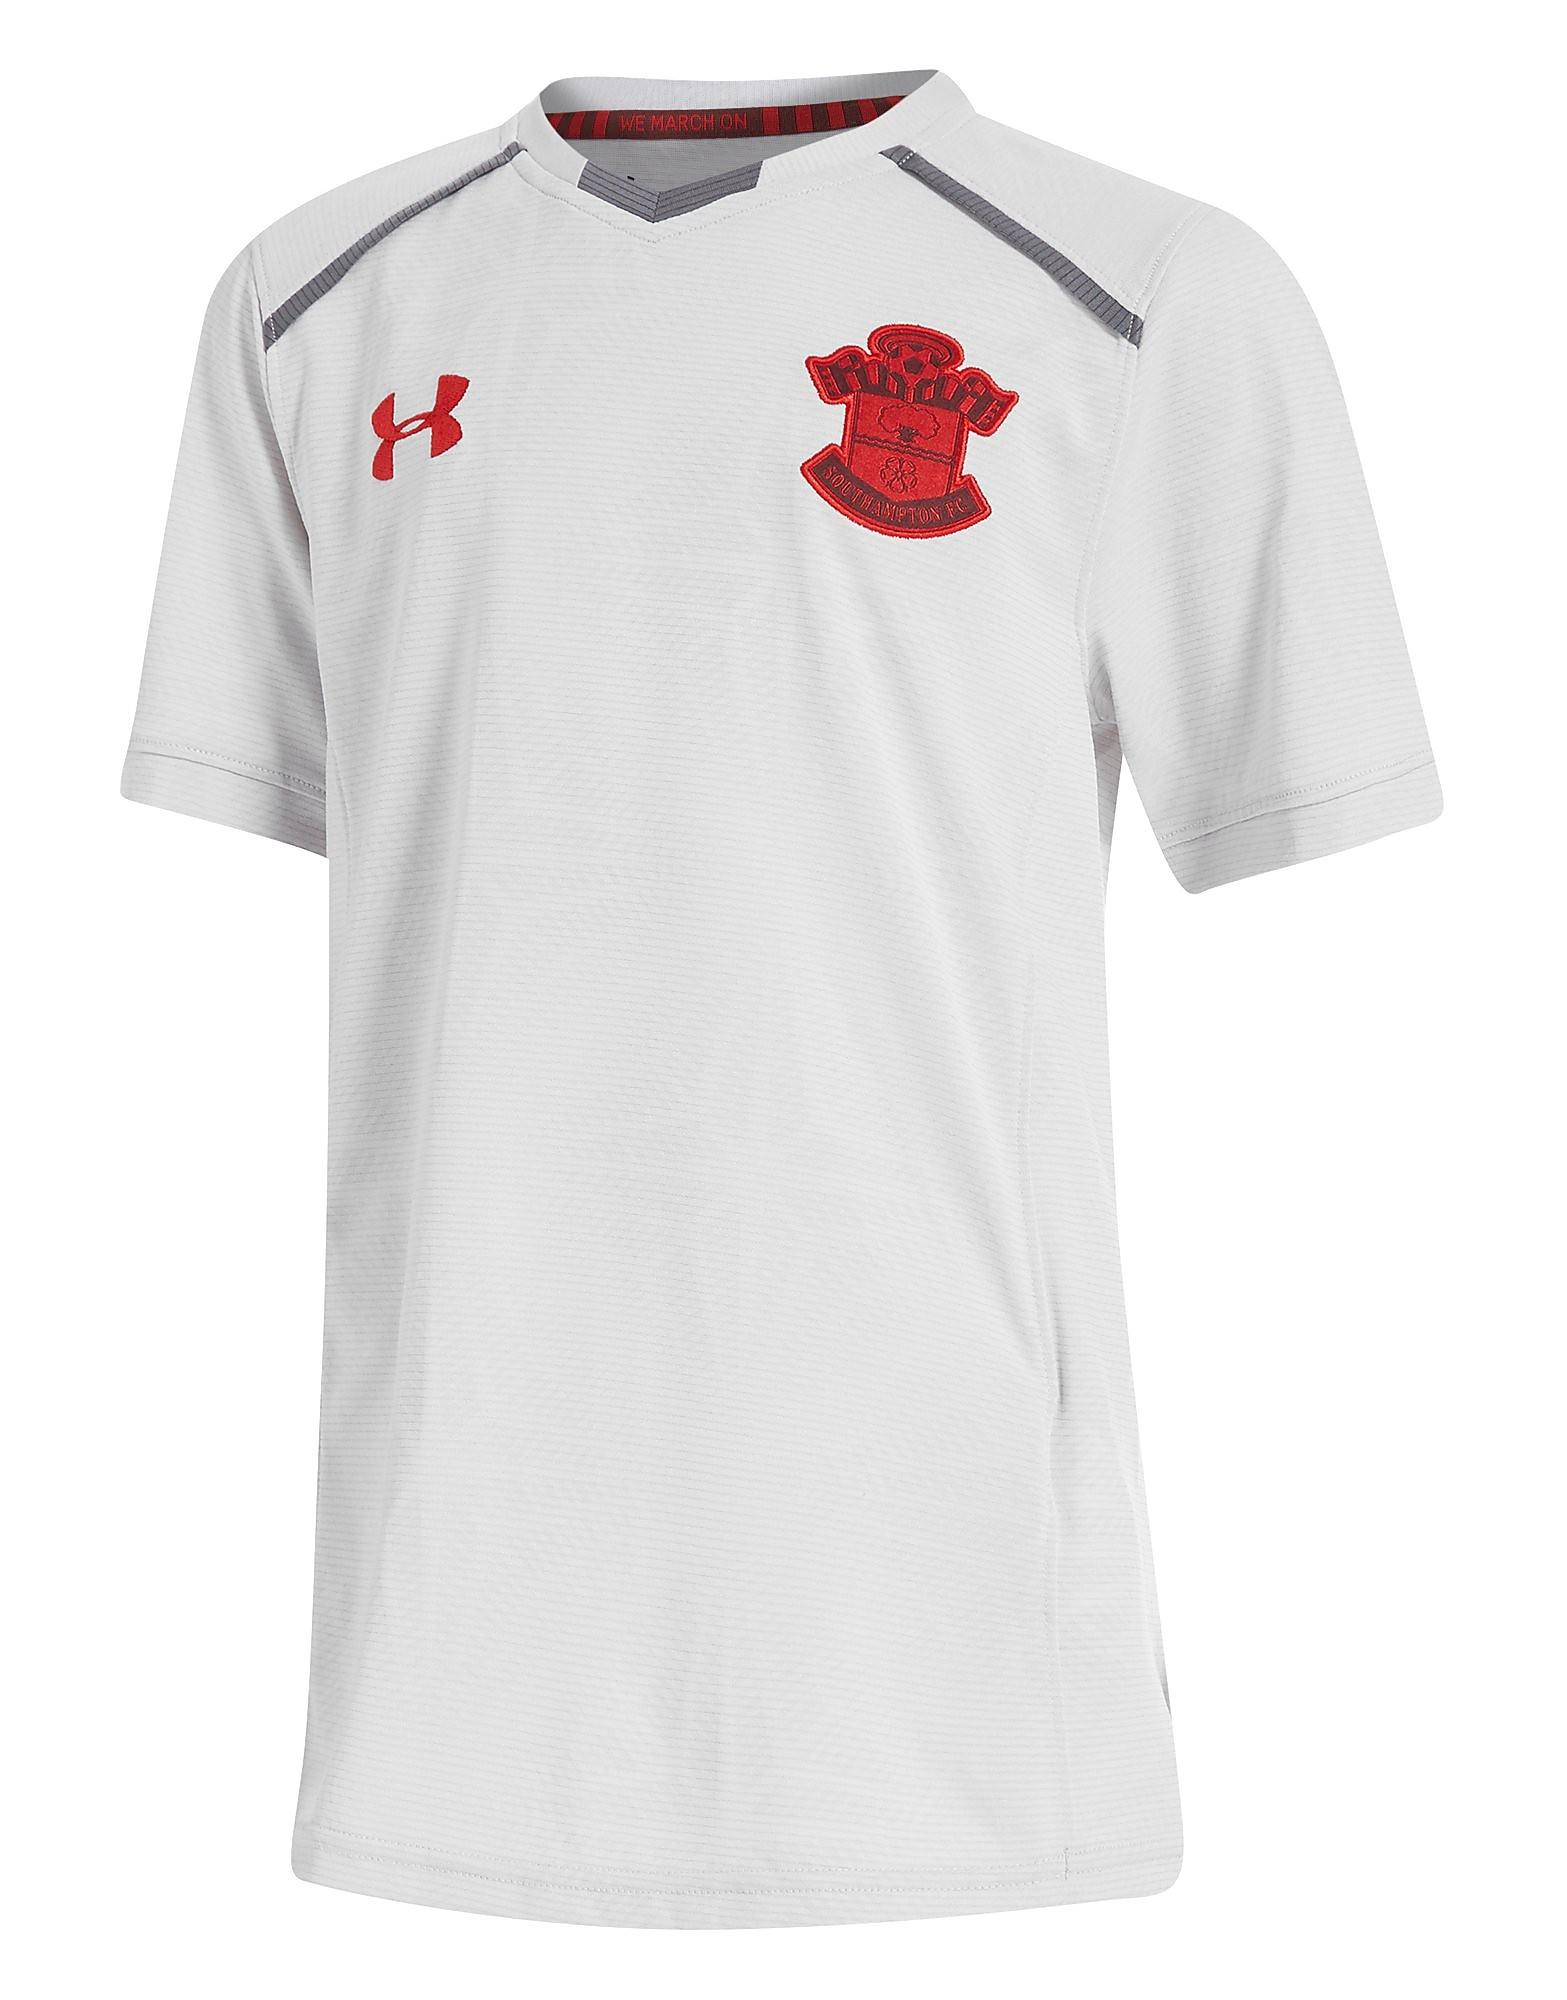 Under Armour Southampton 2017 Training T-Shirt Junior